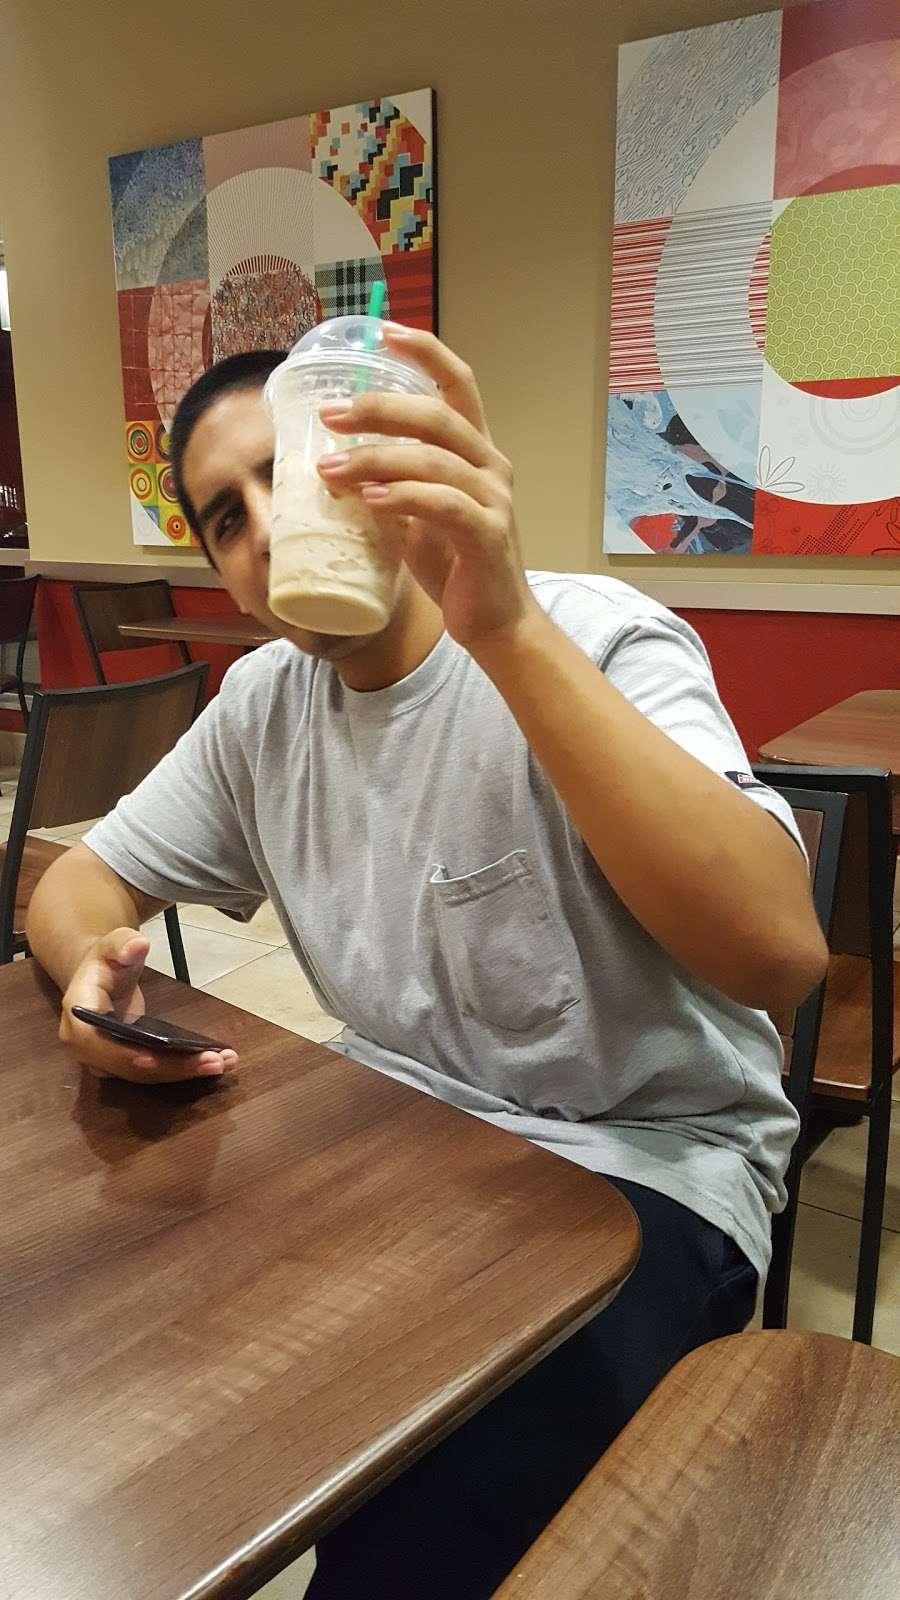 Starbucks - cafe  | Photo 5 of 5 | Address: 14823 Pomerado Rd, Poway, CA 92064, USA | Phone: (858) 679-8202